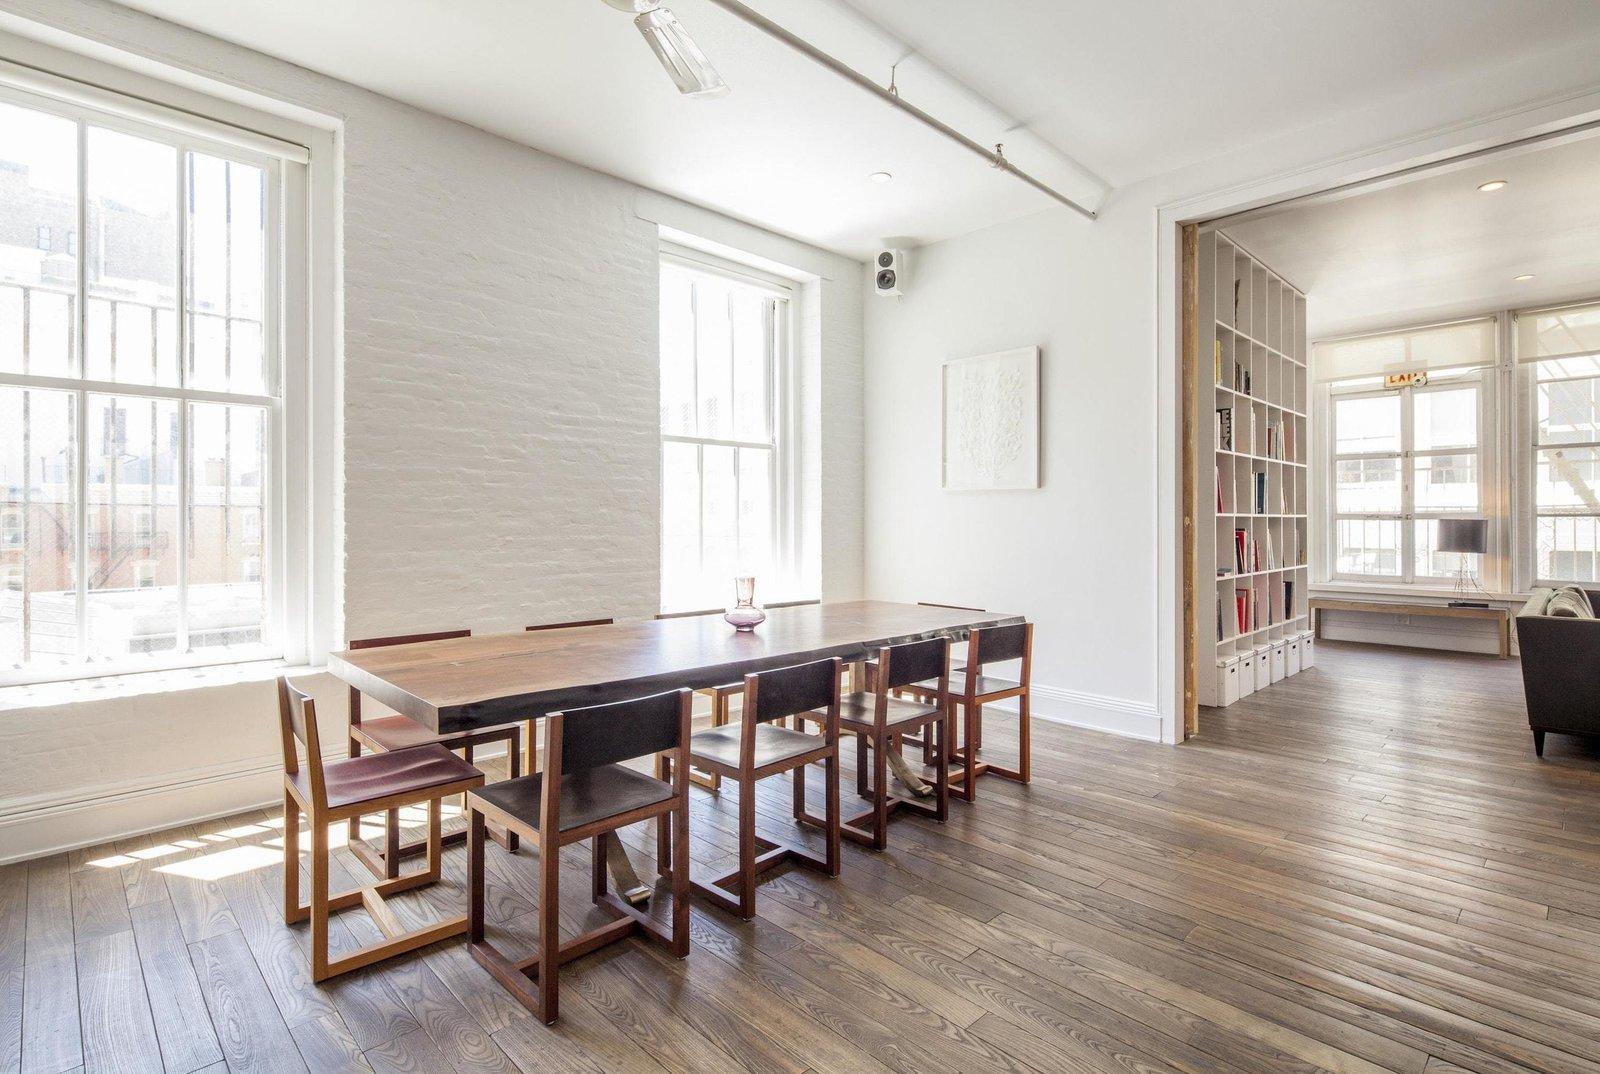 Dining Room, Chair, Recessed Lighting, Medium Hardwood Floor, and Table  Prince Street